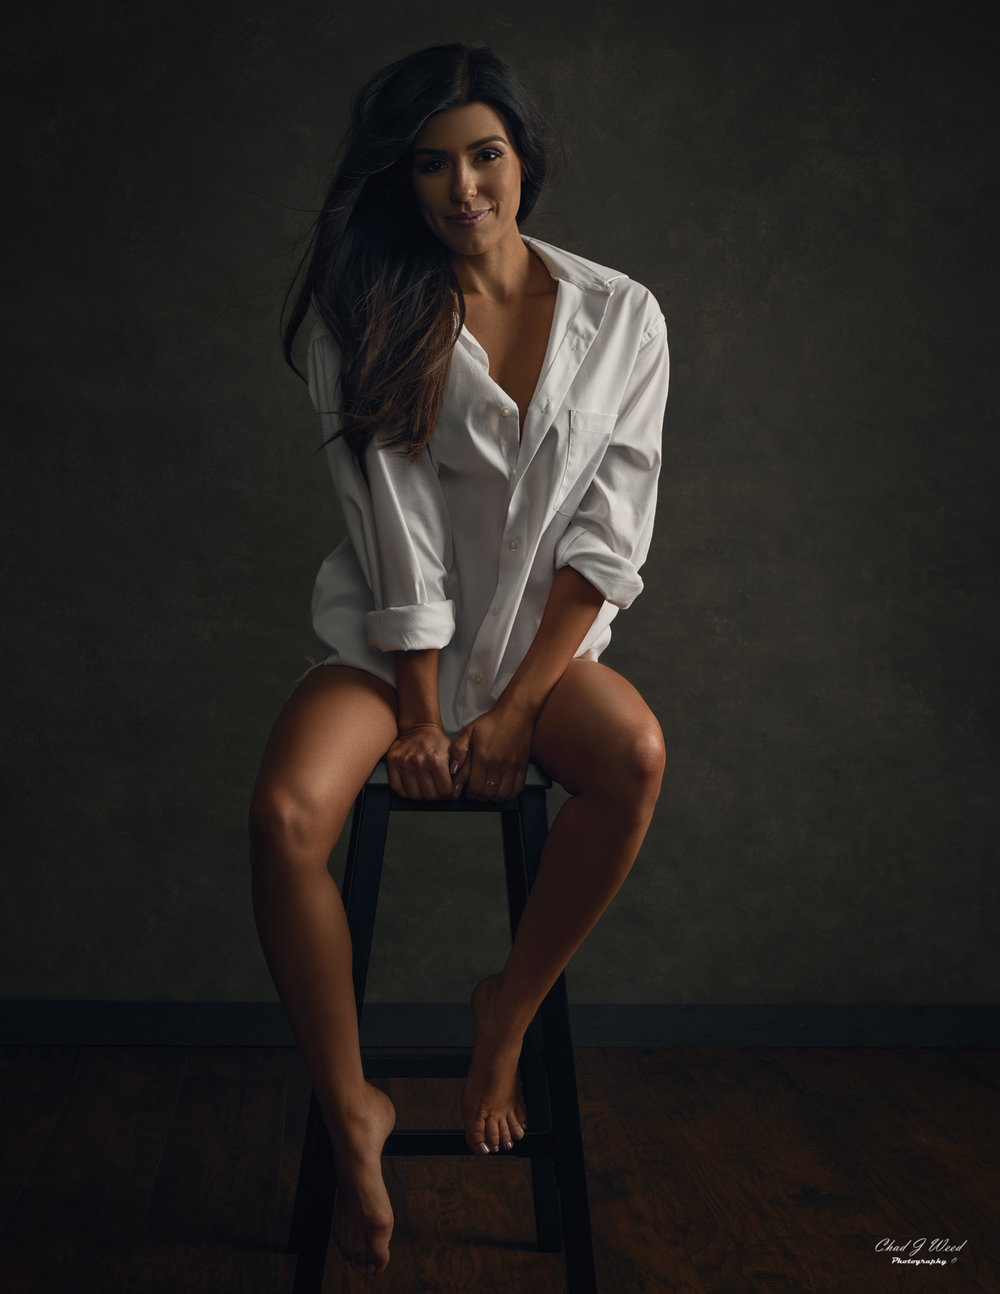 Arizona Portrait Photographer Chad Weed - Fashion Model Callie